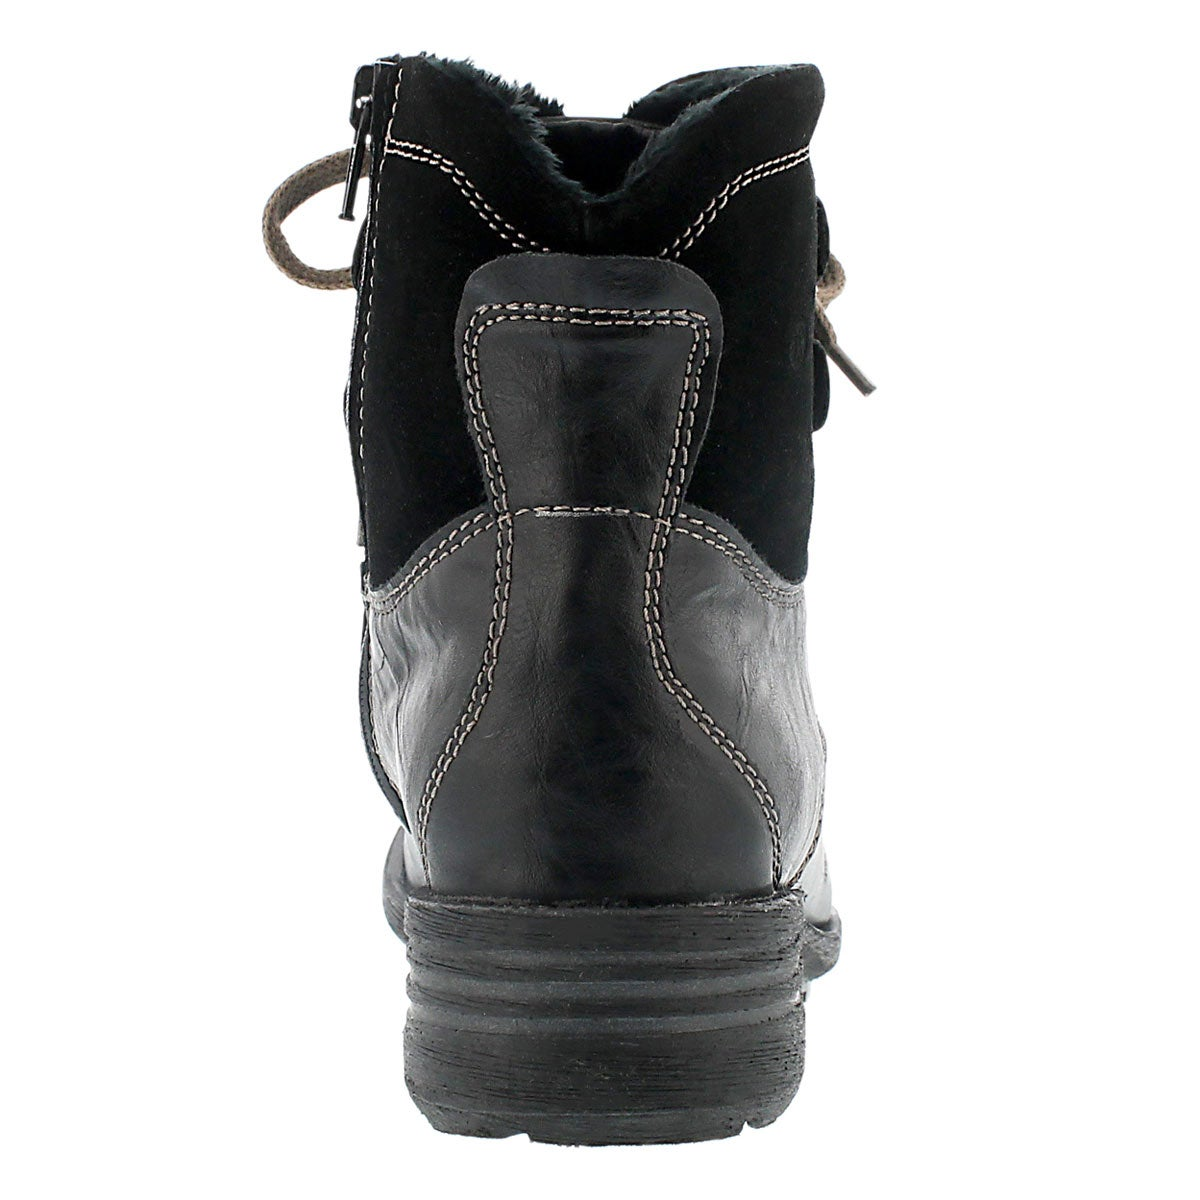 Lds Sandra 14 blk lthr laceup ankle boot